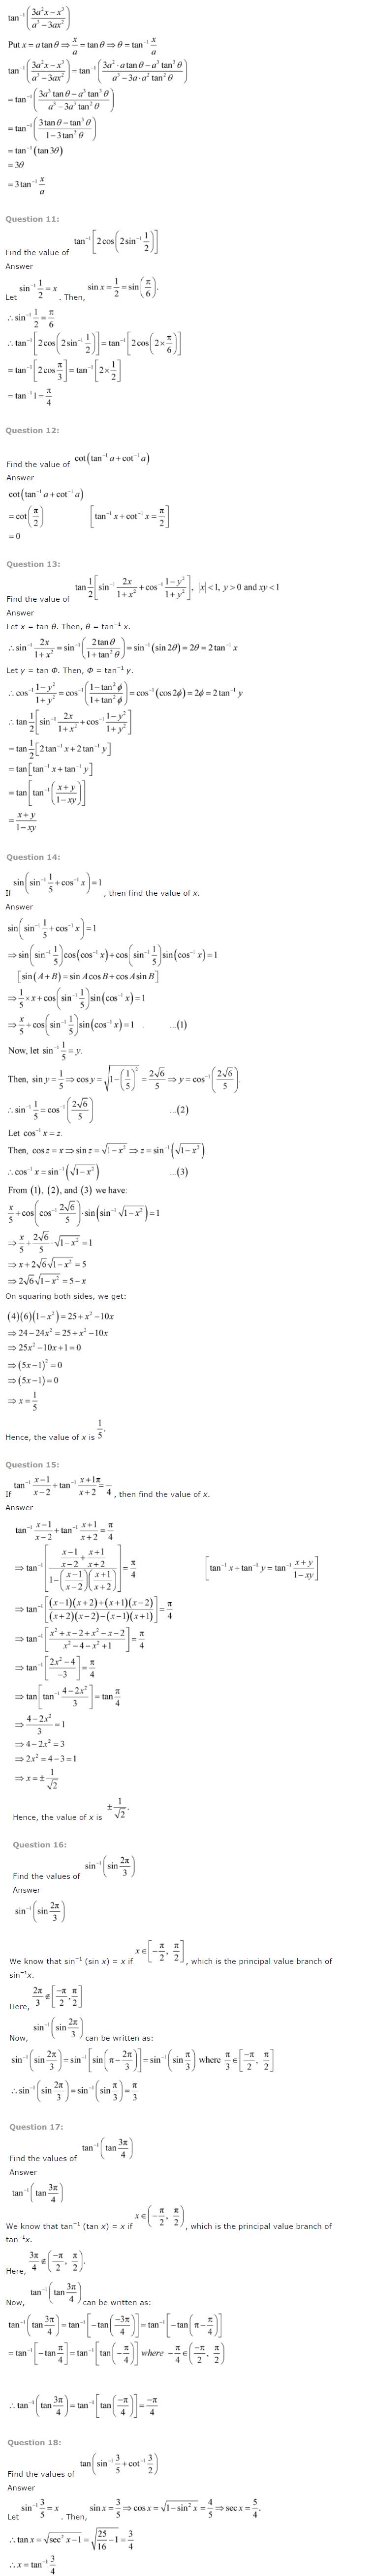 NCERT Solutions for Class 12 Maths Chapter 2 - Inverse